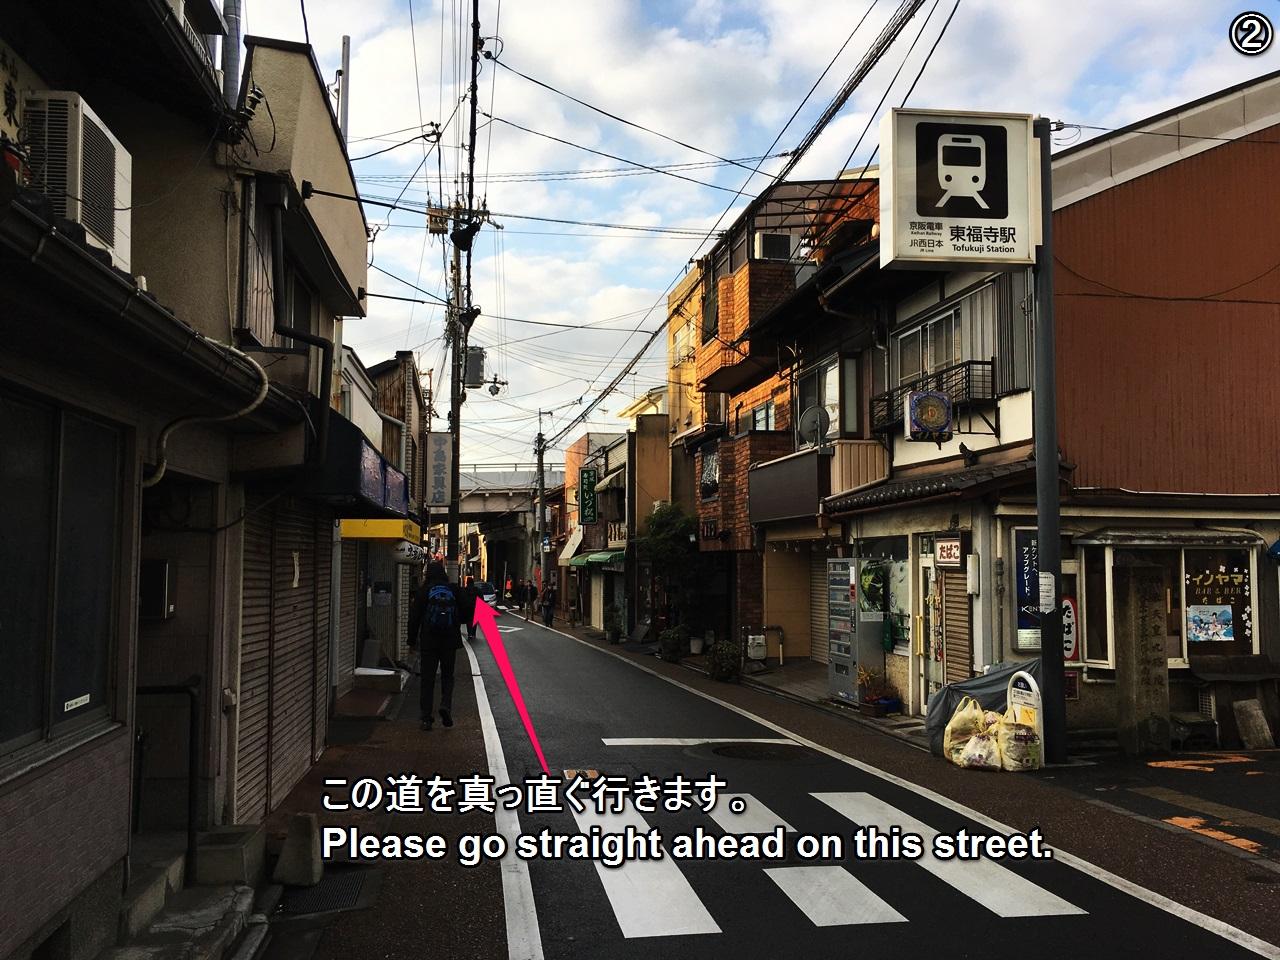 tofukuji-htg-02